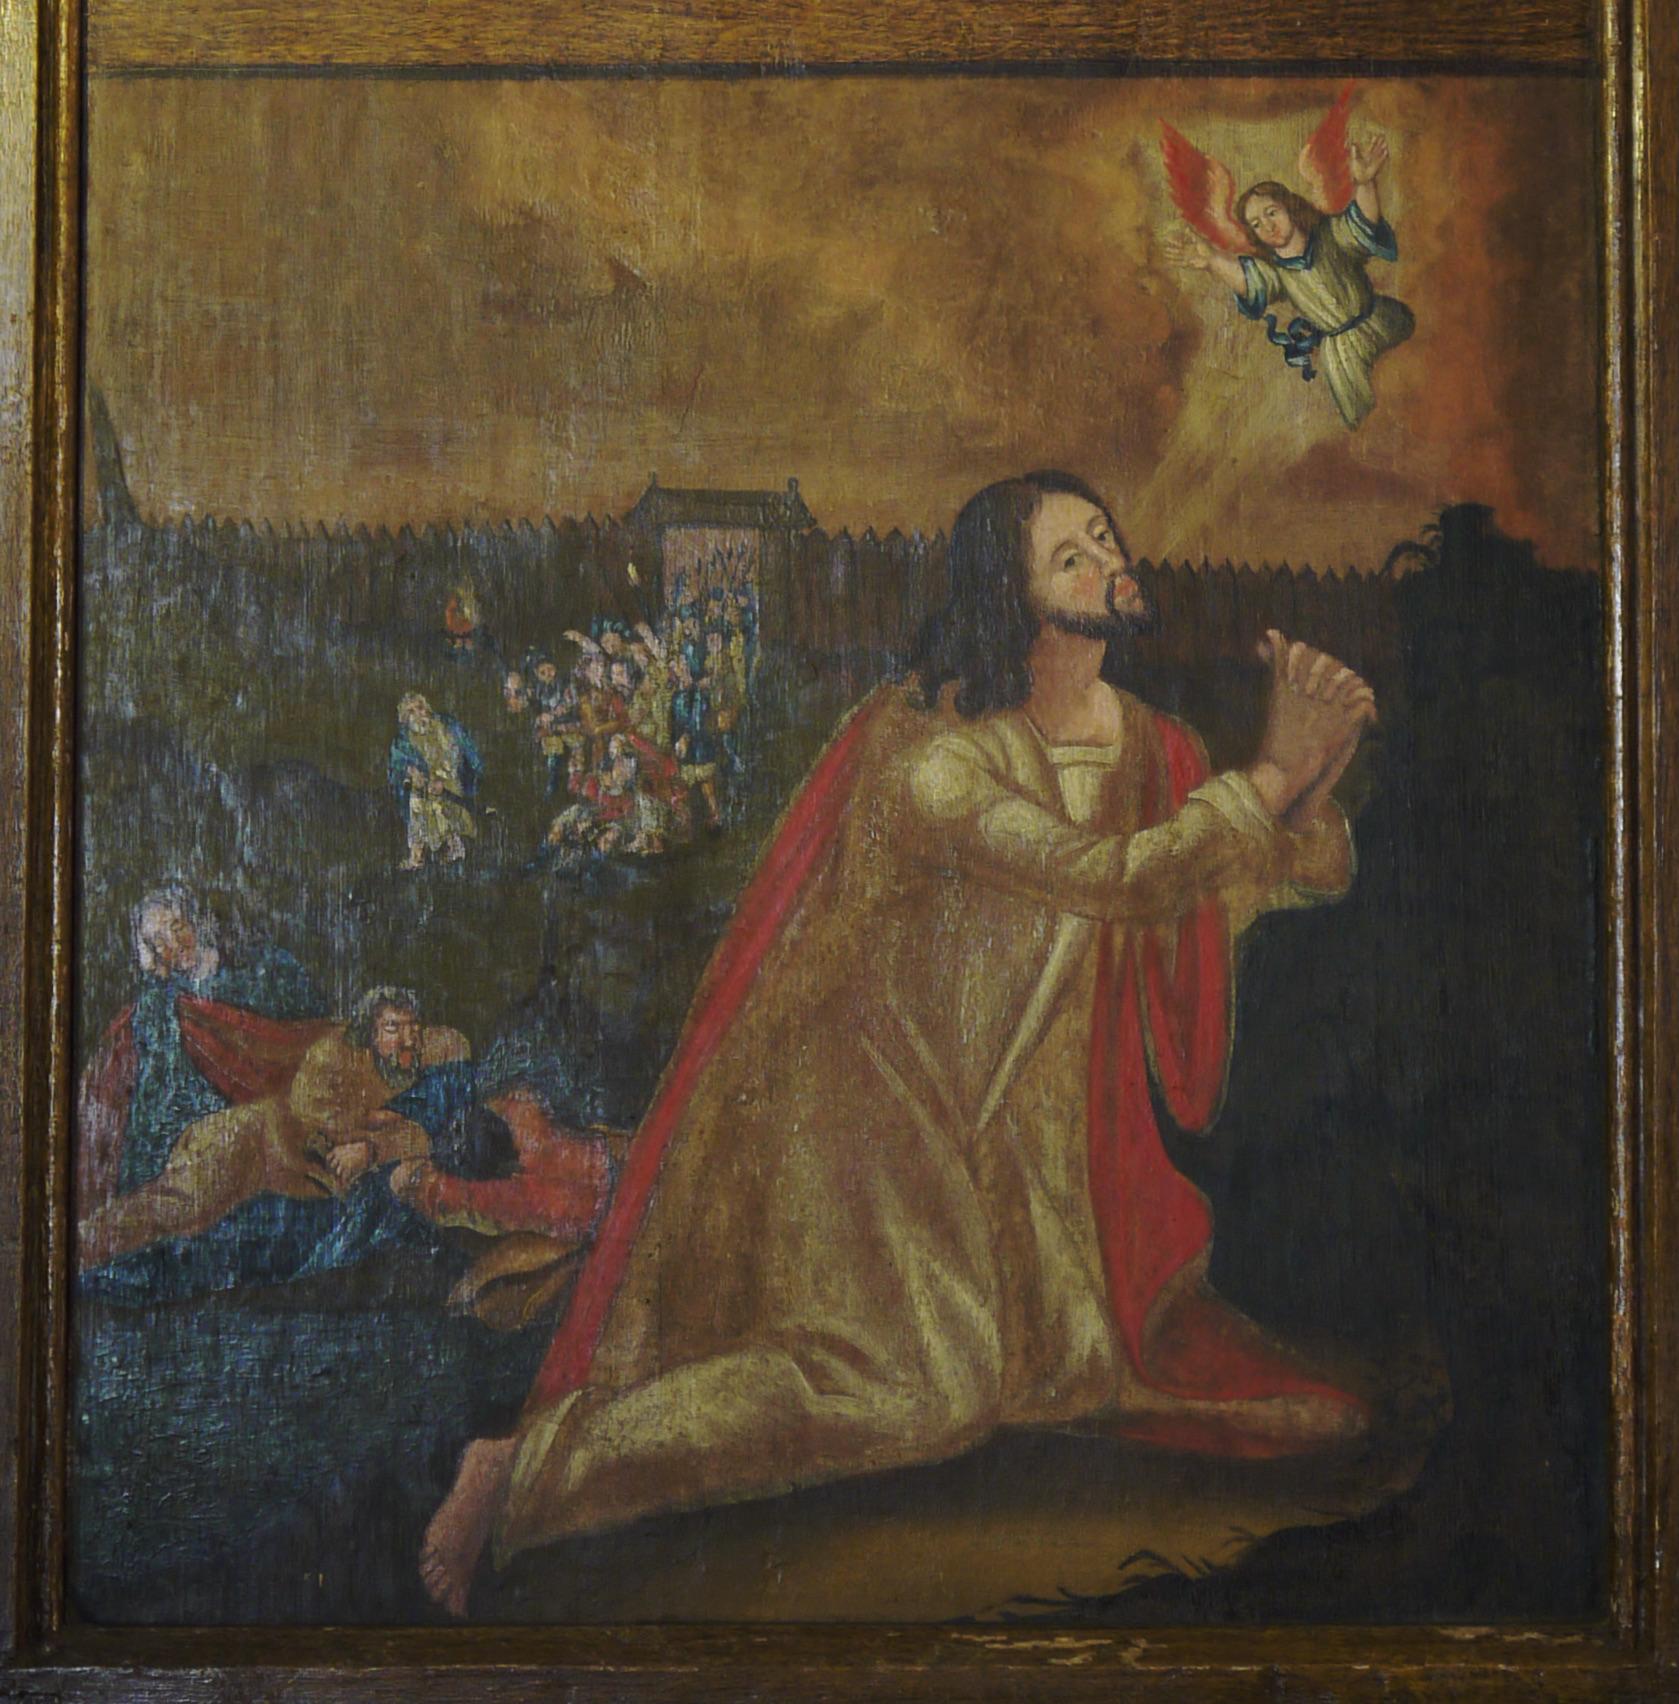 Flügelretabel,Stuer,barockes Flügelbild, Gethsemane